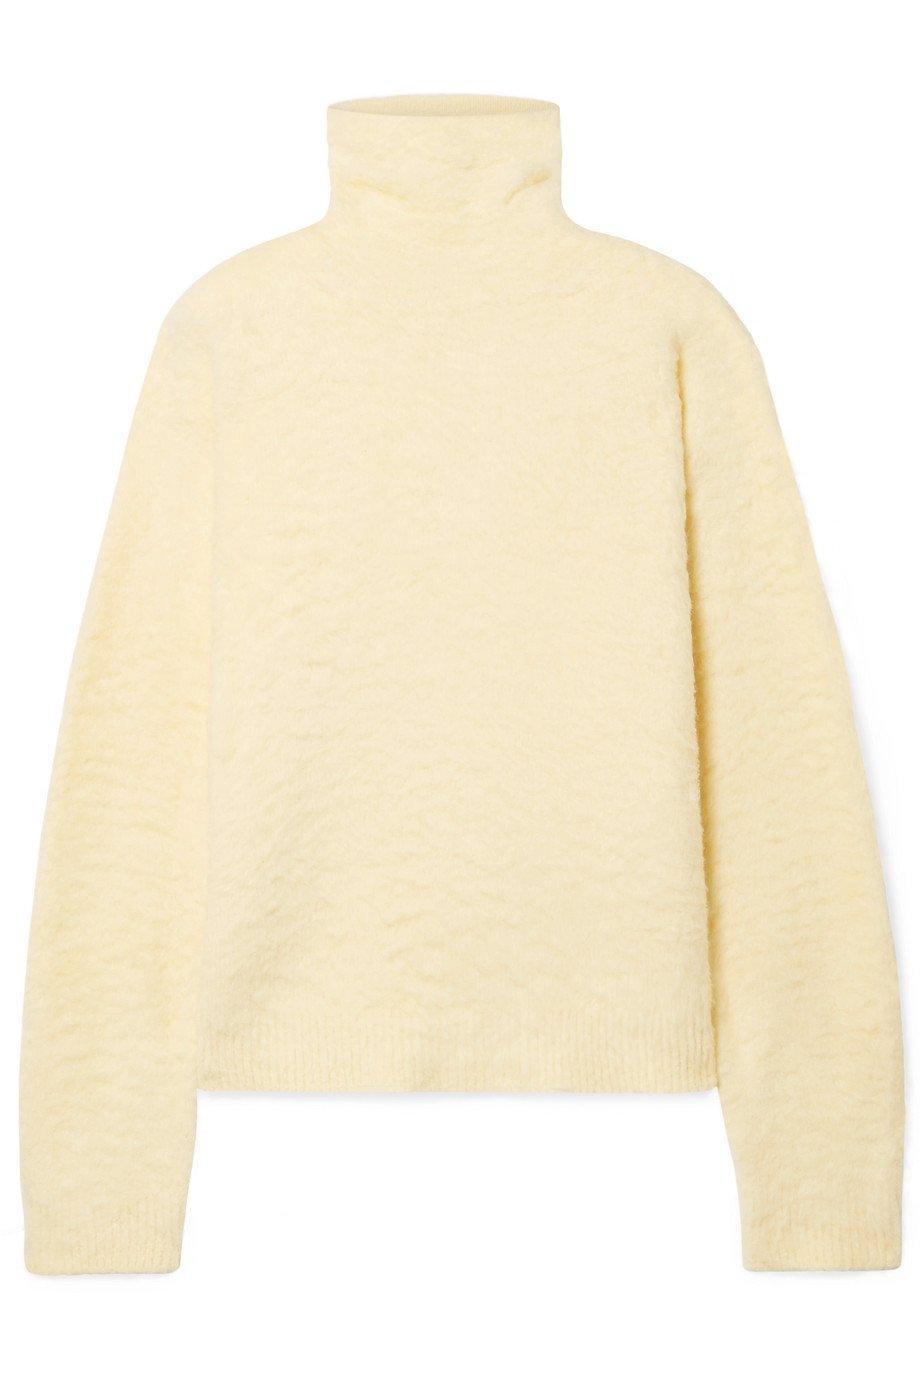 Acne Studios   Kristel cotton-blend turtleneck sweater   NET-A-PORTER.COM